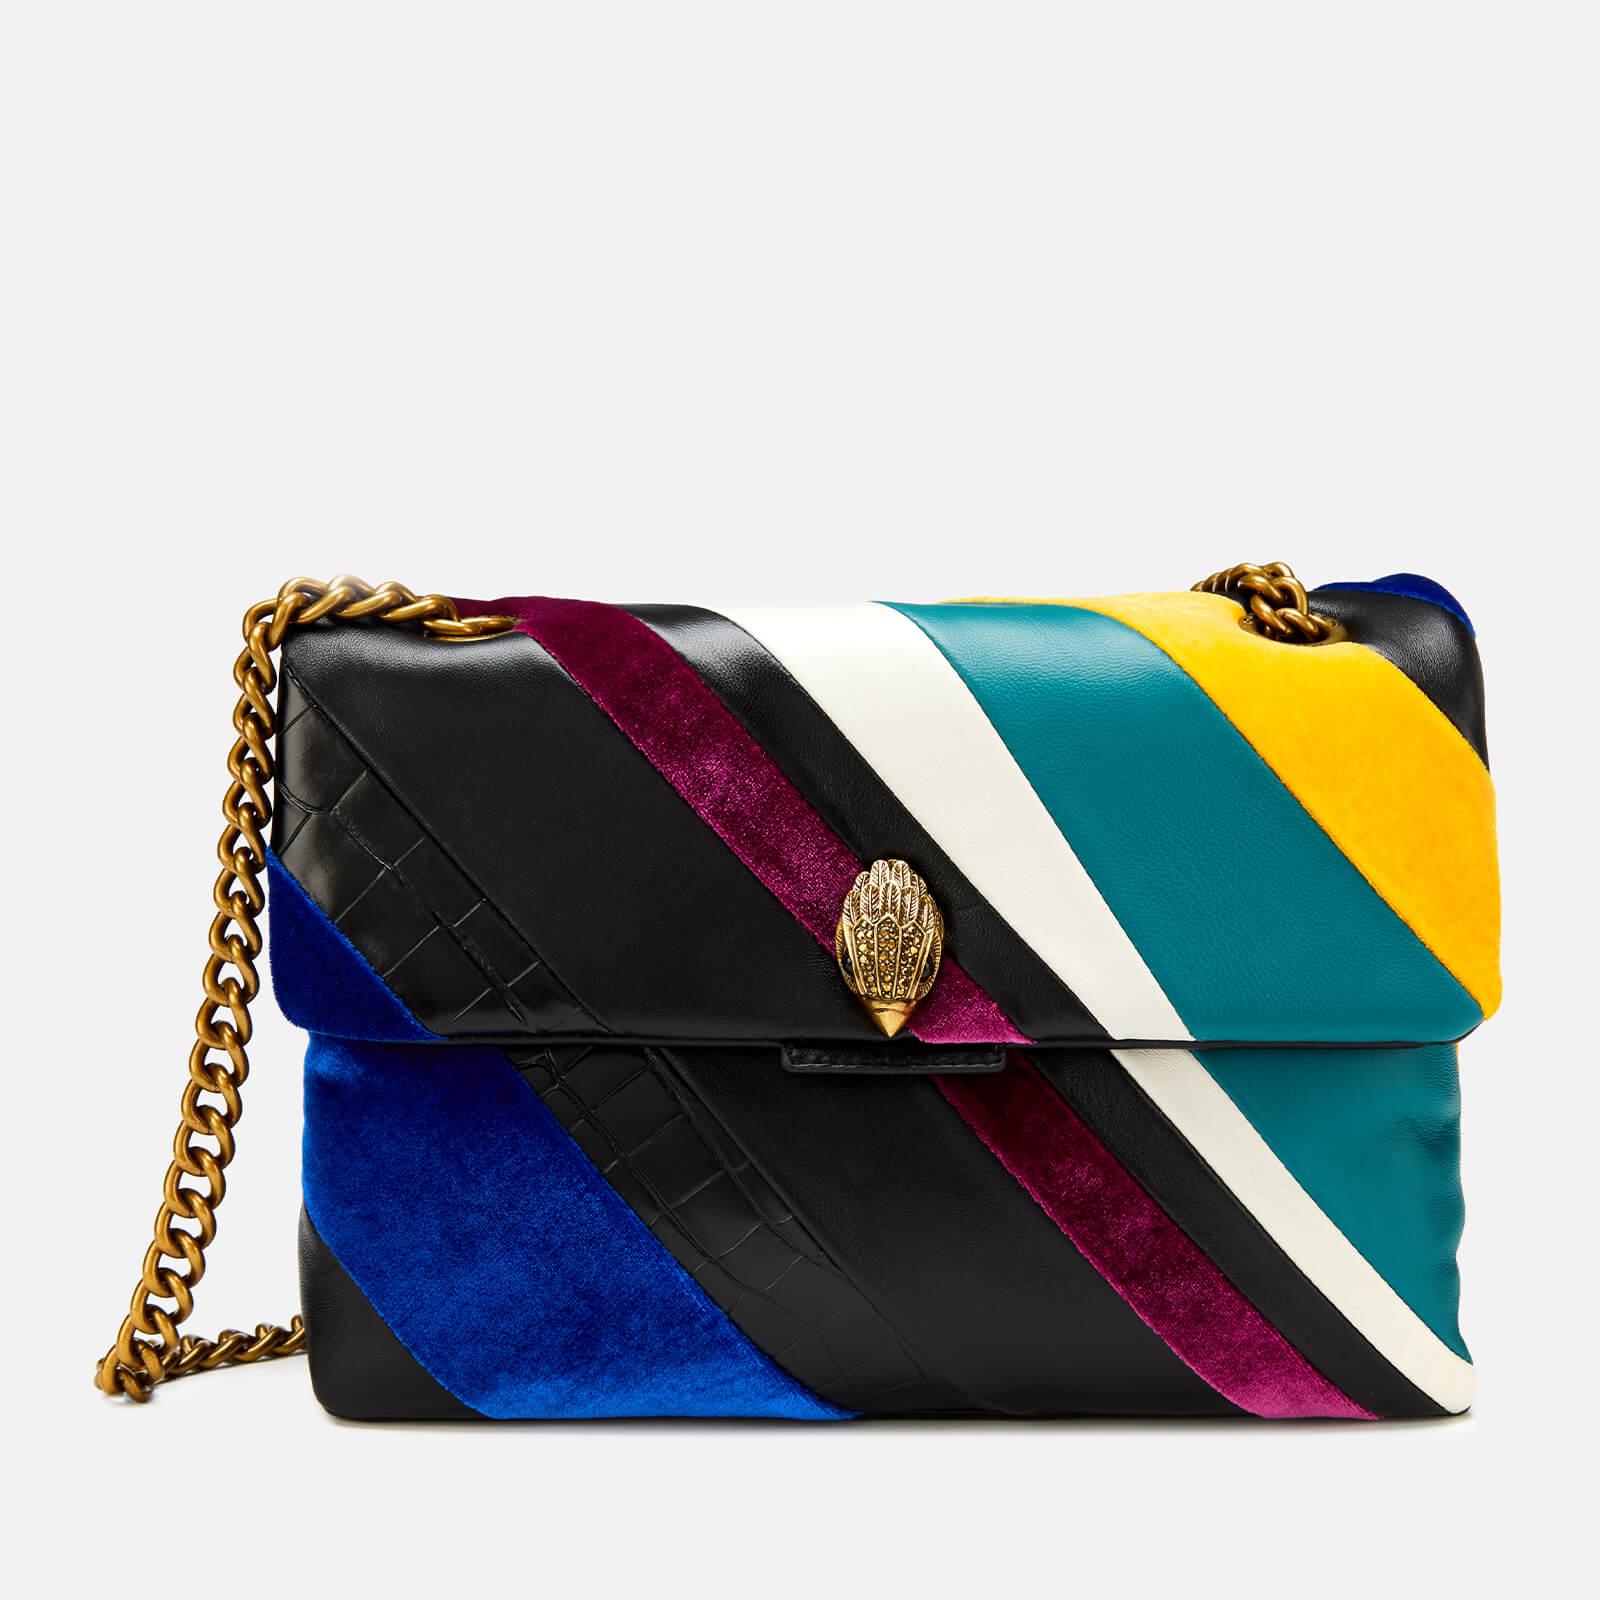 Kurt Geiger Women's Large Kensington S Bag - Black/Green